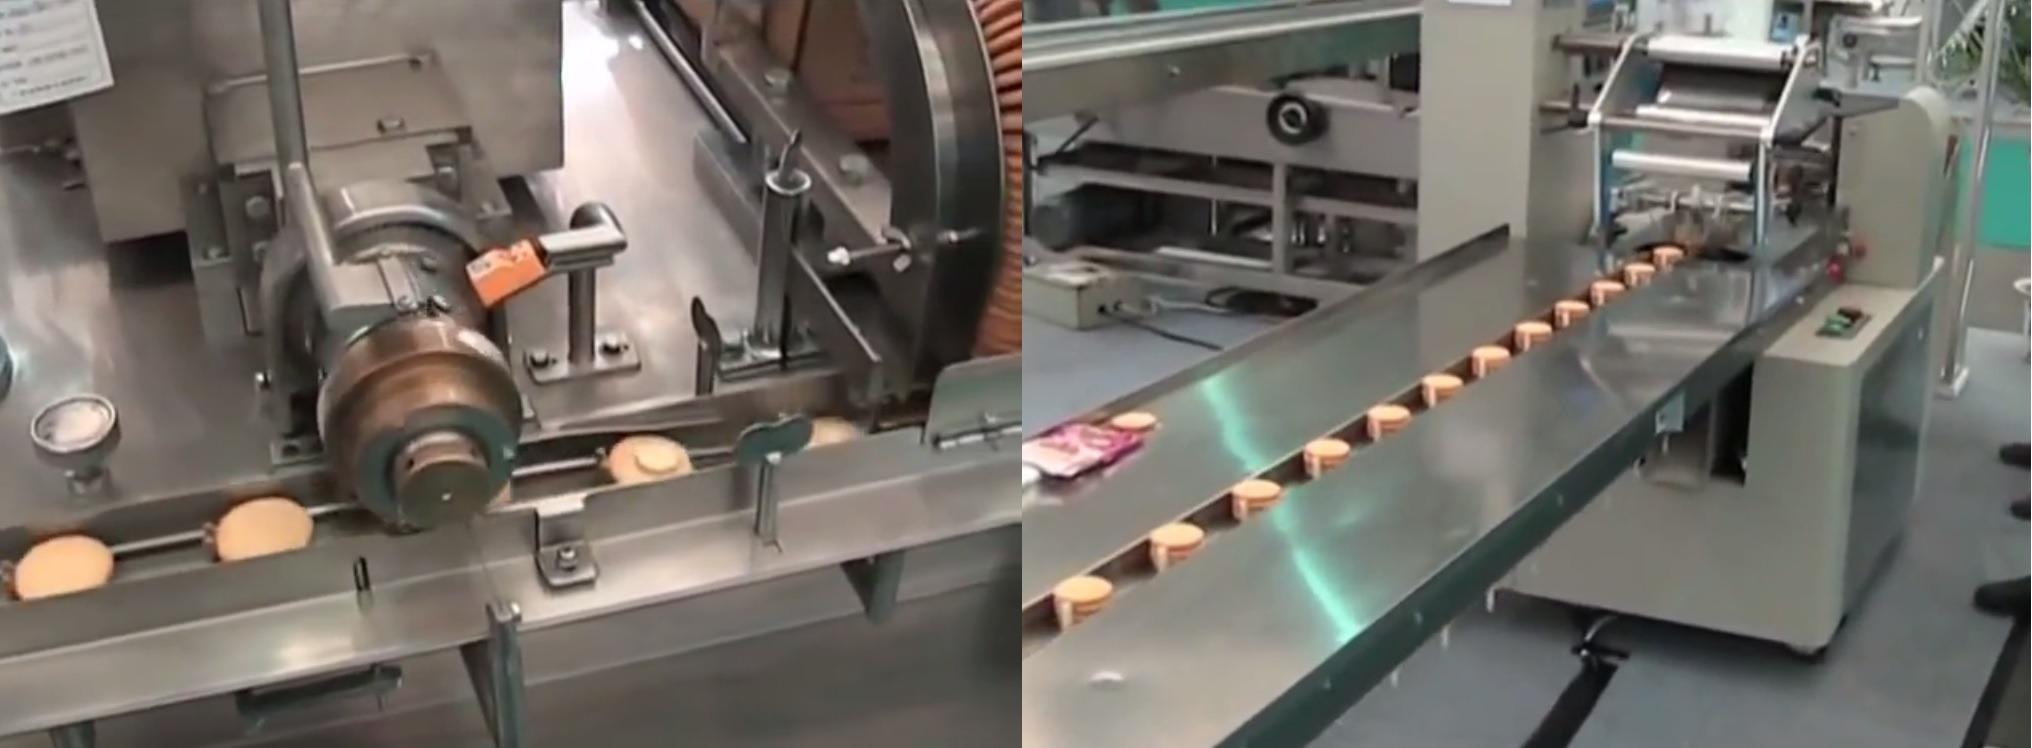 Máy kẹp kem kết nối máy đóng gói